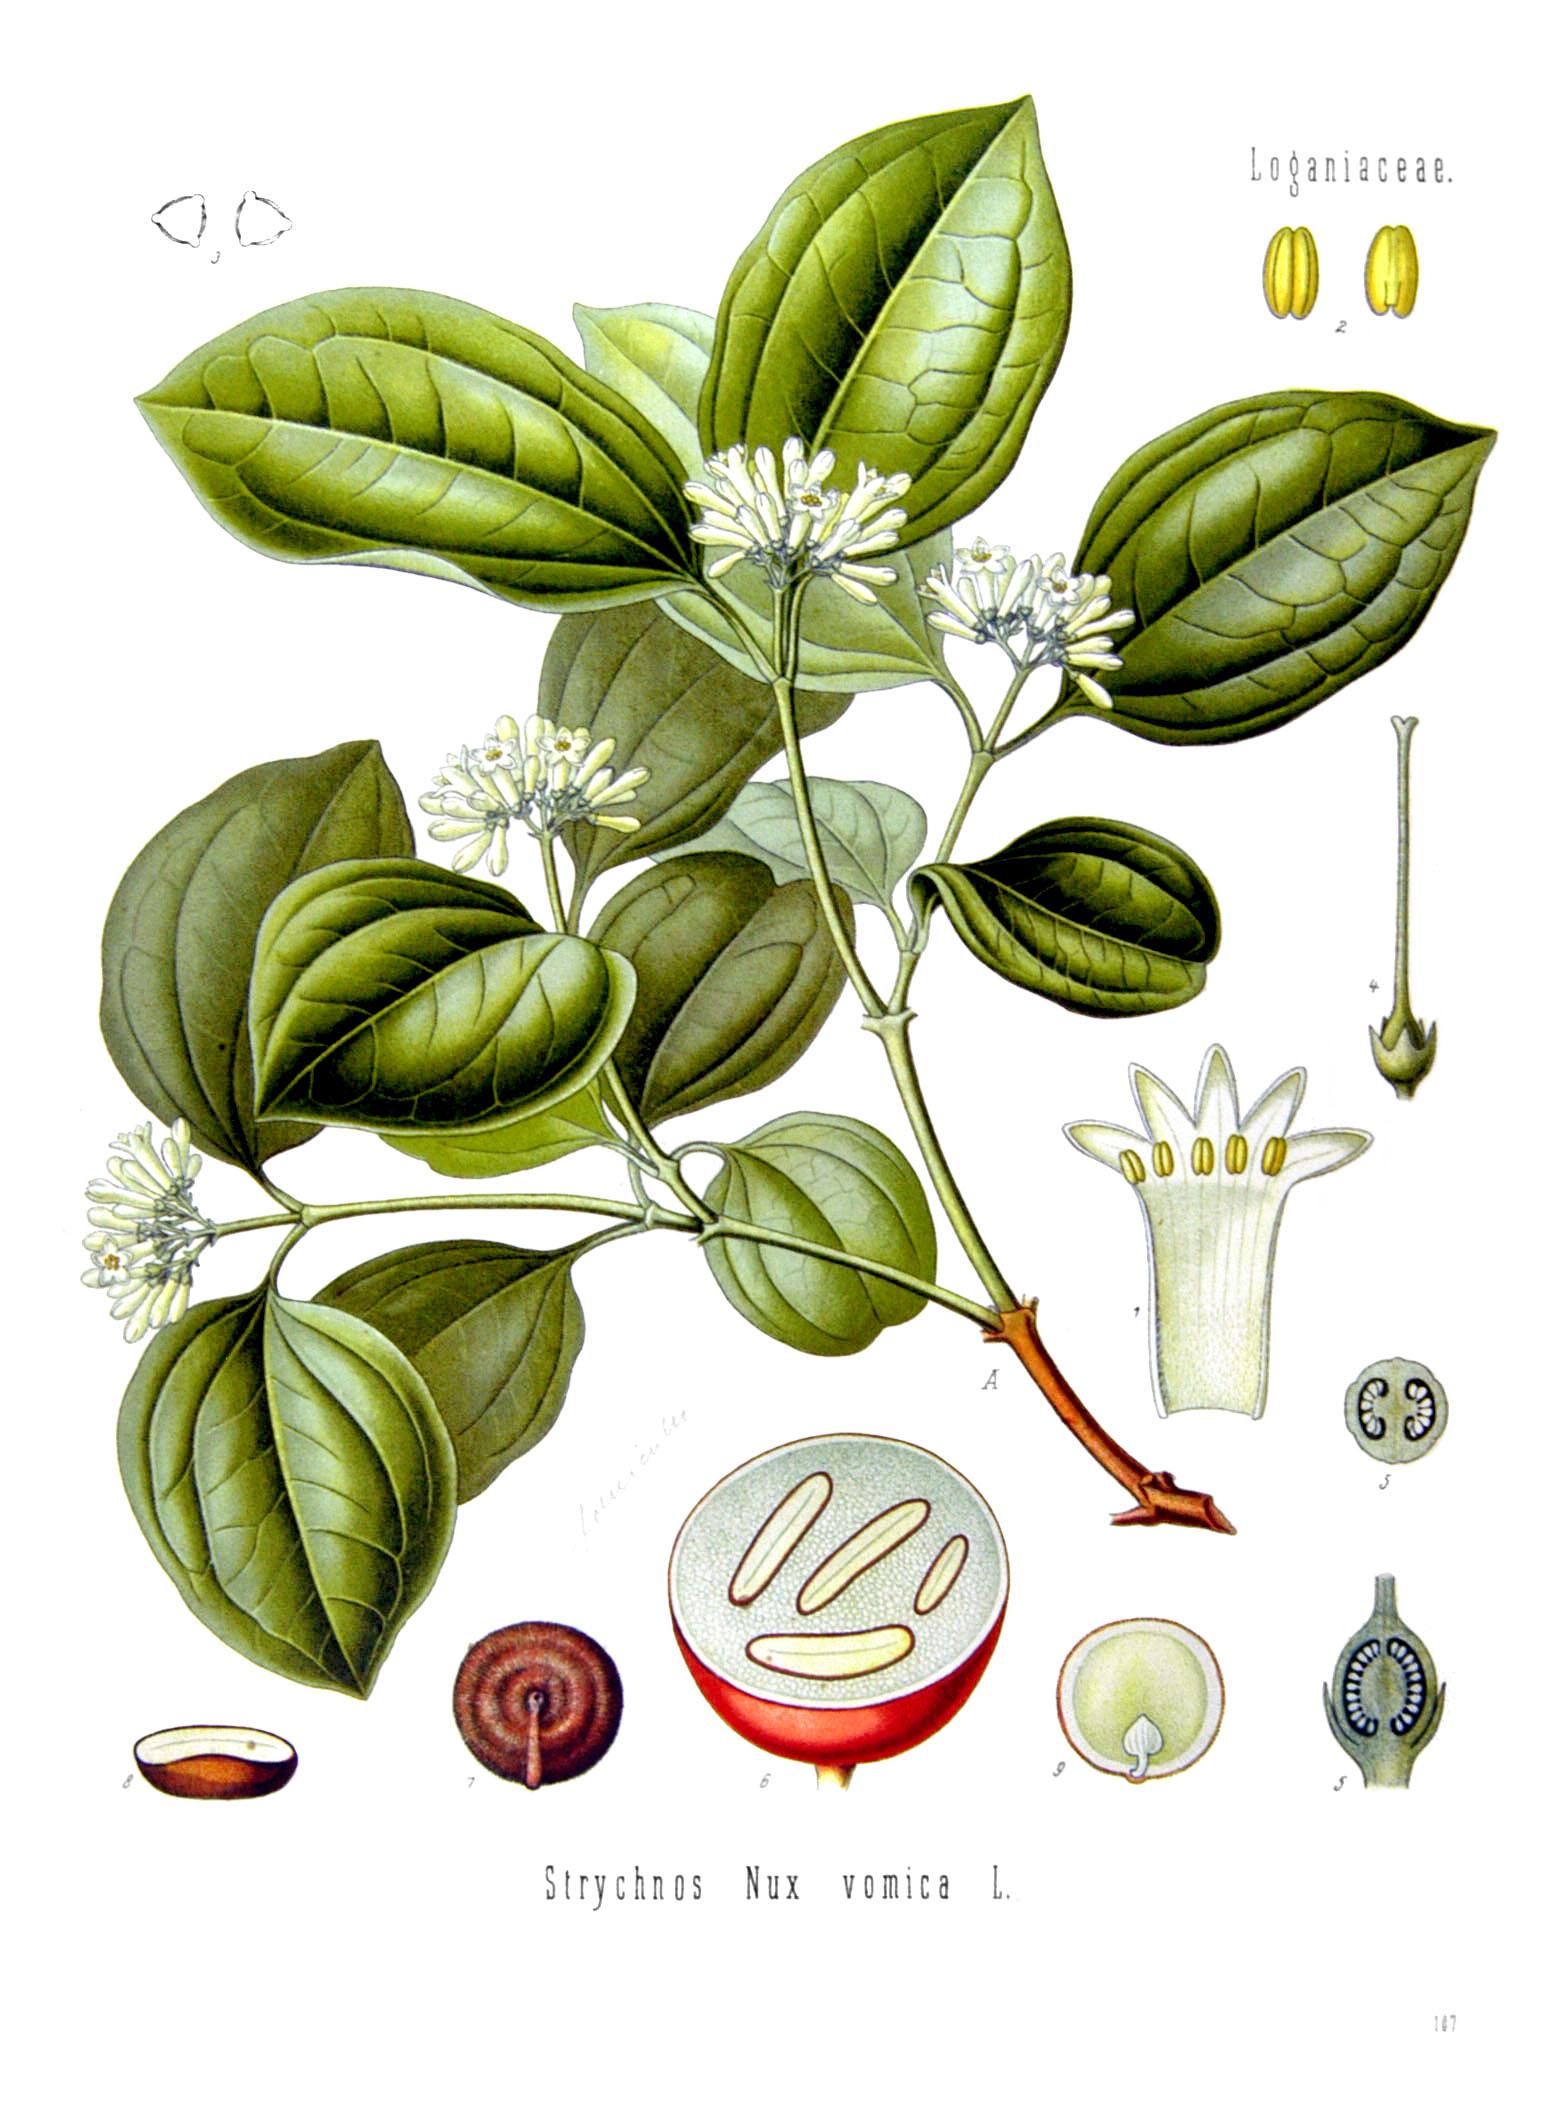 Strychnos_nux-vomica_-_K%C3%B6hler%E2%80%93s_Medizinal-Pflanzen-266.jpg